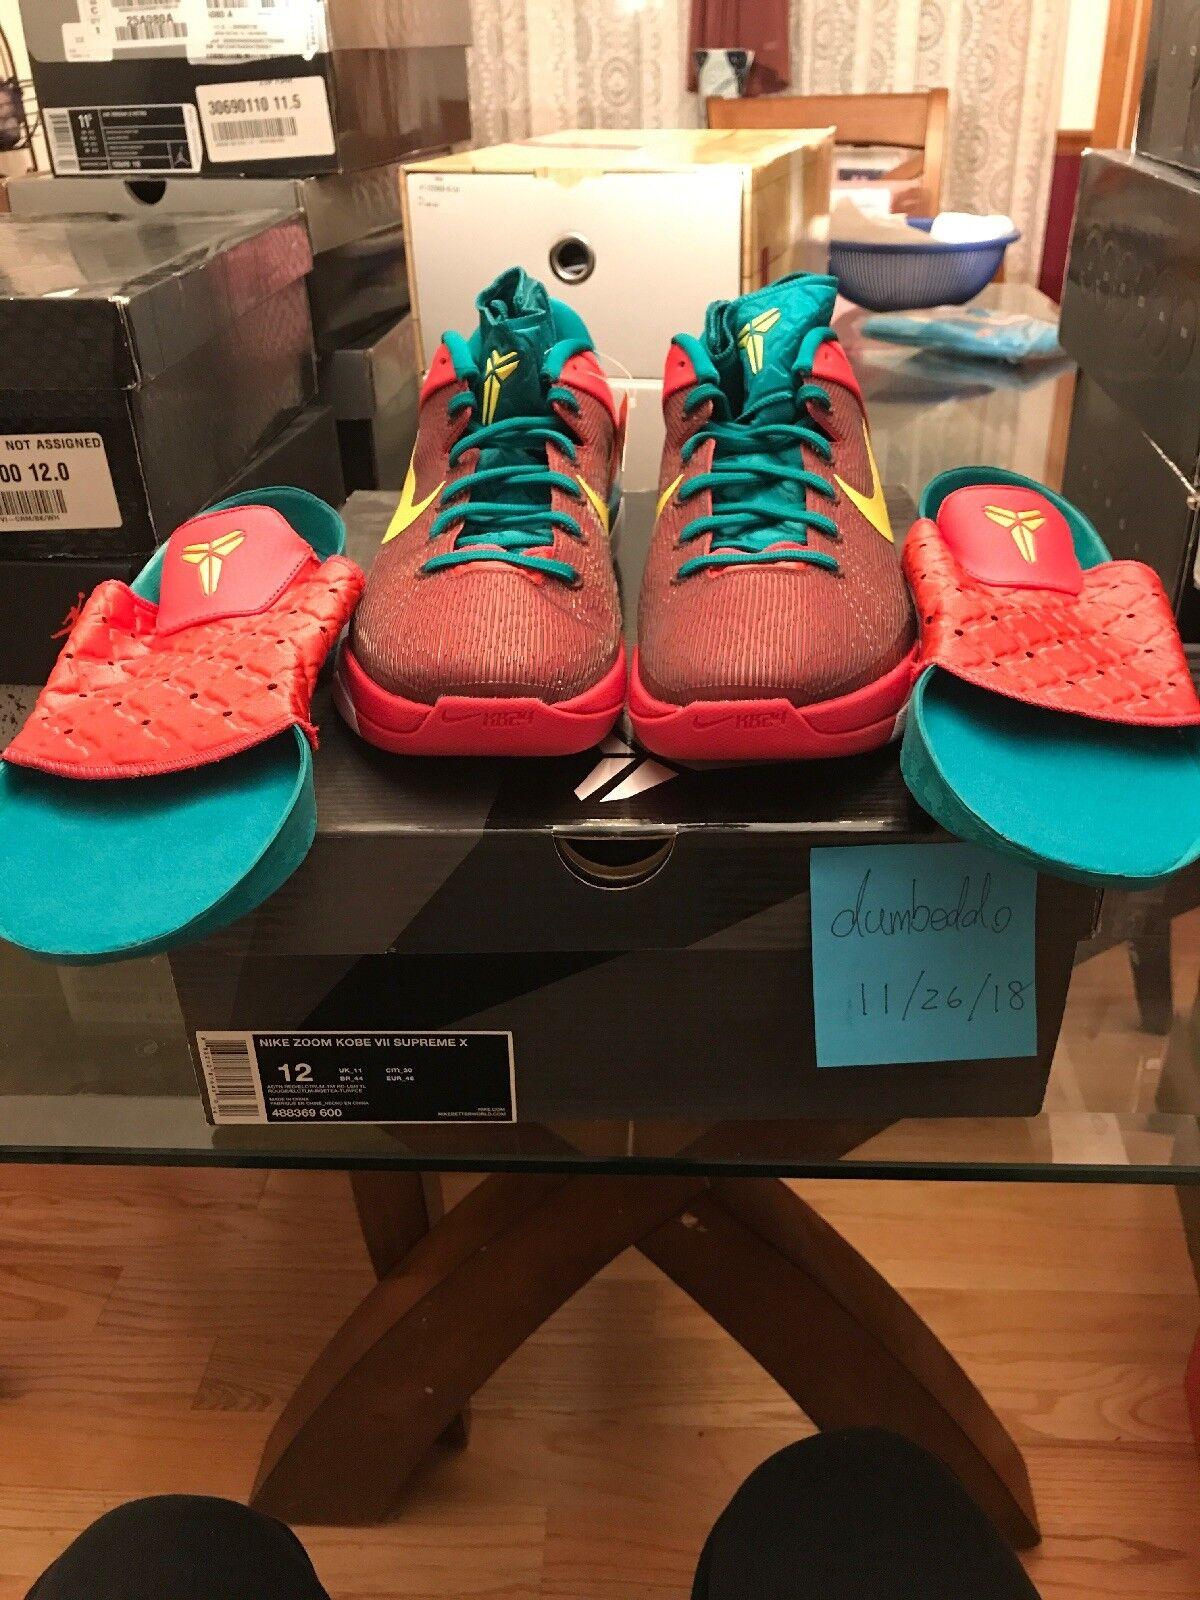 Nike Zoom KOBE VII 7 SUPREME X YOTD YEAR OF OF OF THE DRAGON RED ELECTROLIME TEAL Sz12 a981af